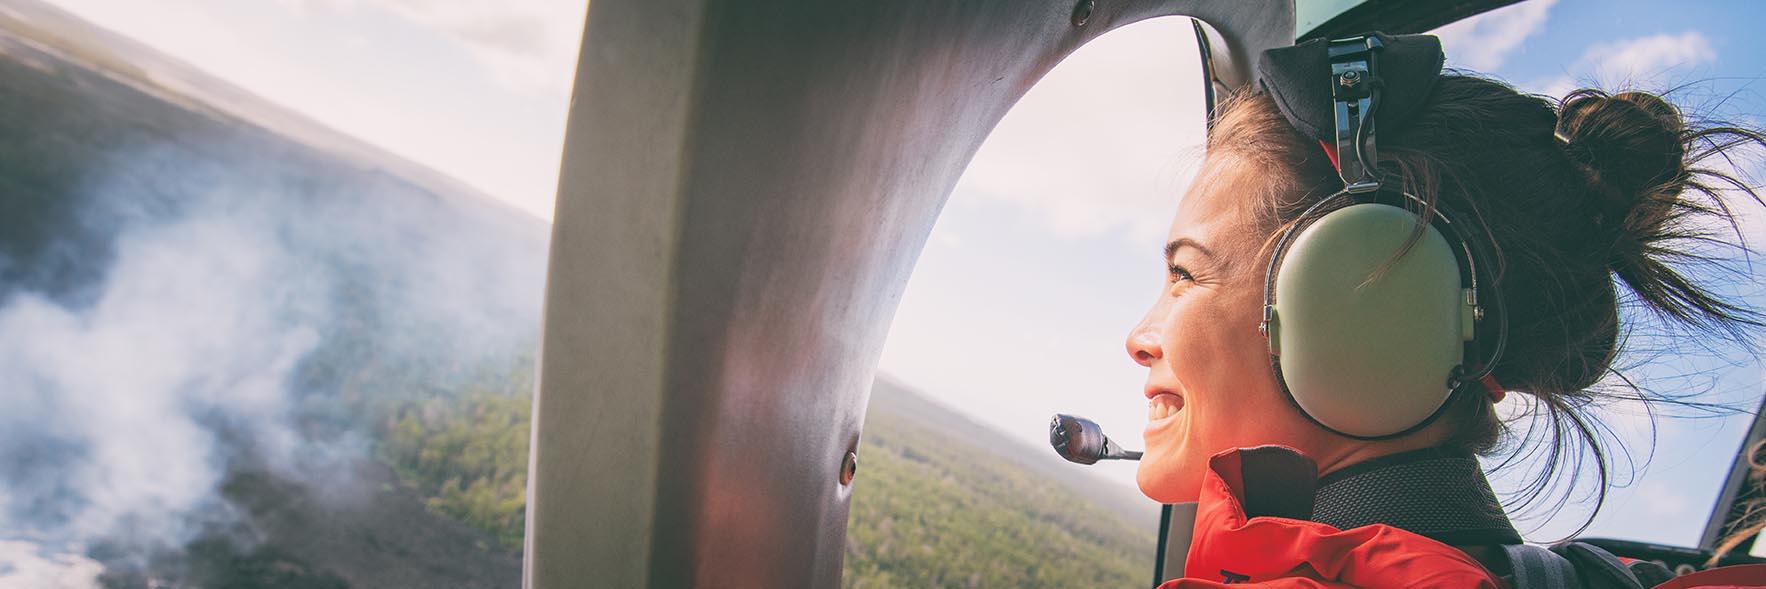 Hos oss kan du ta helikopterkörkort i Göteborg